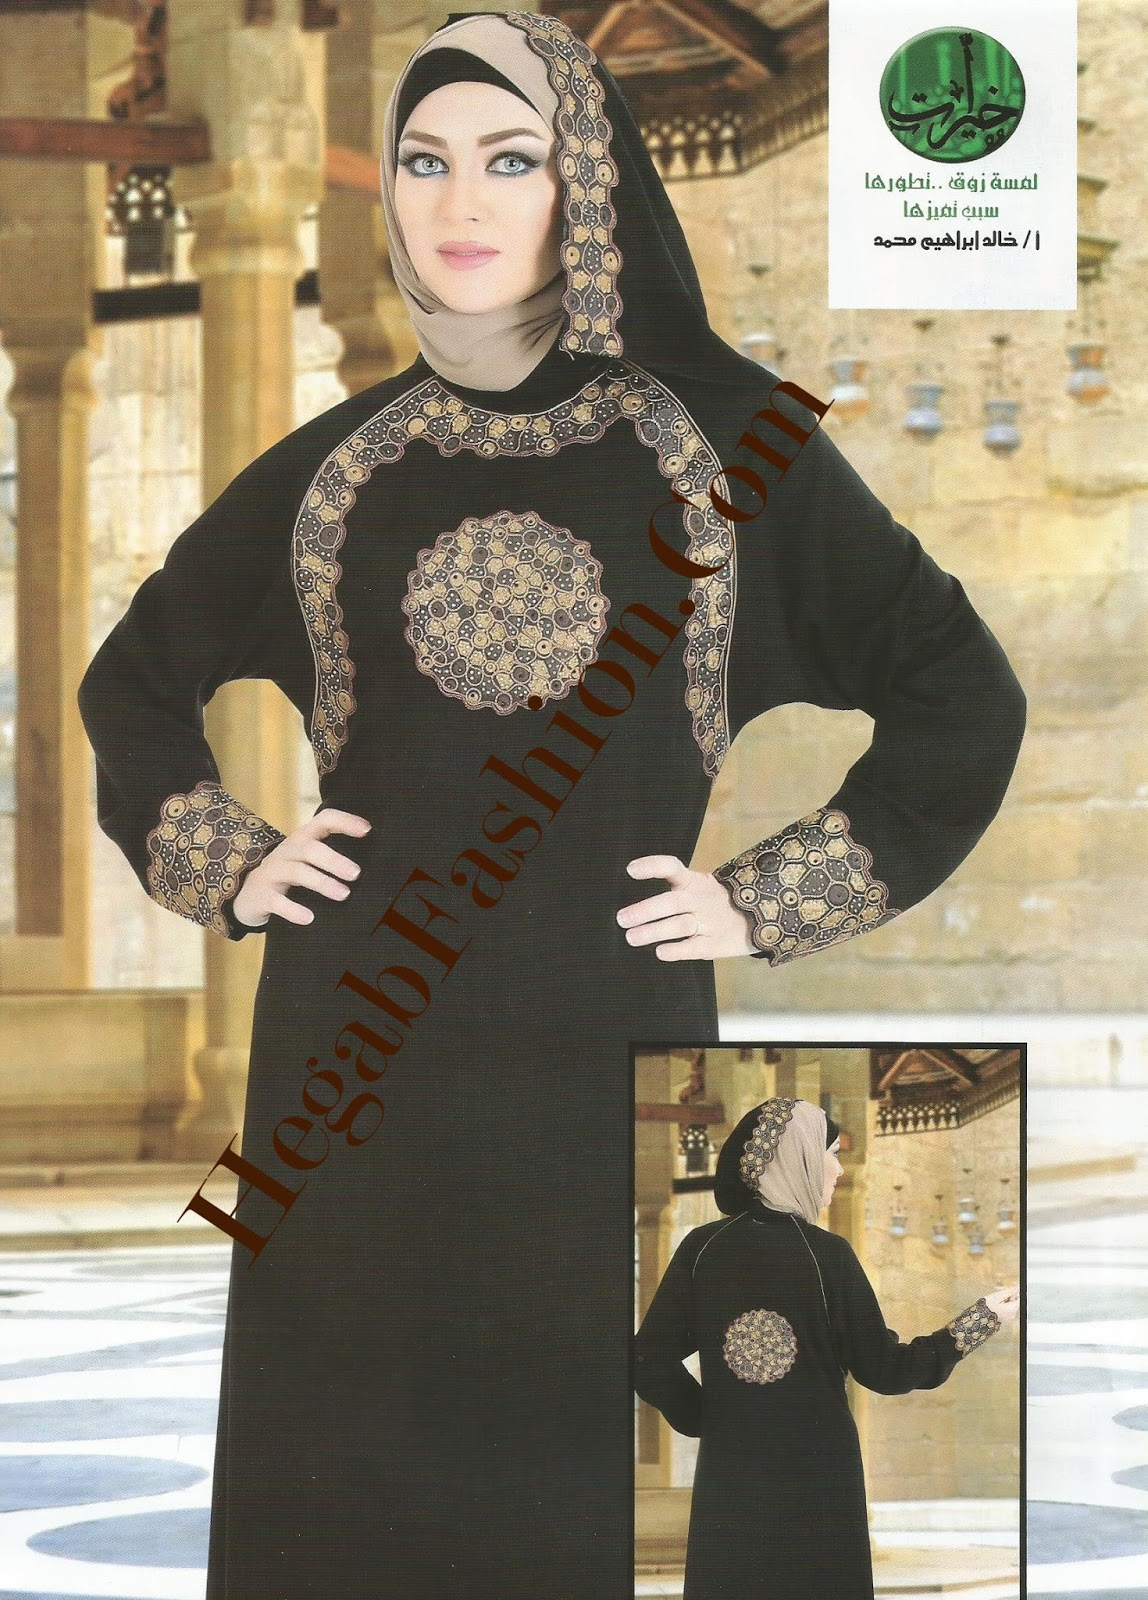 9598e21b6 مجلة حجاب فاشون - Hijab Fashion Magazine: أزياء خيرات - مجلة آخر ...